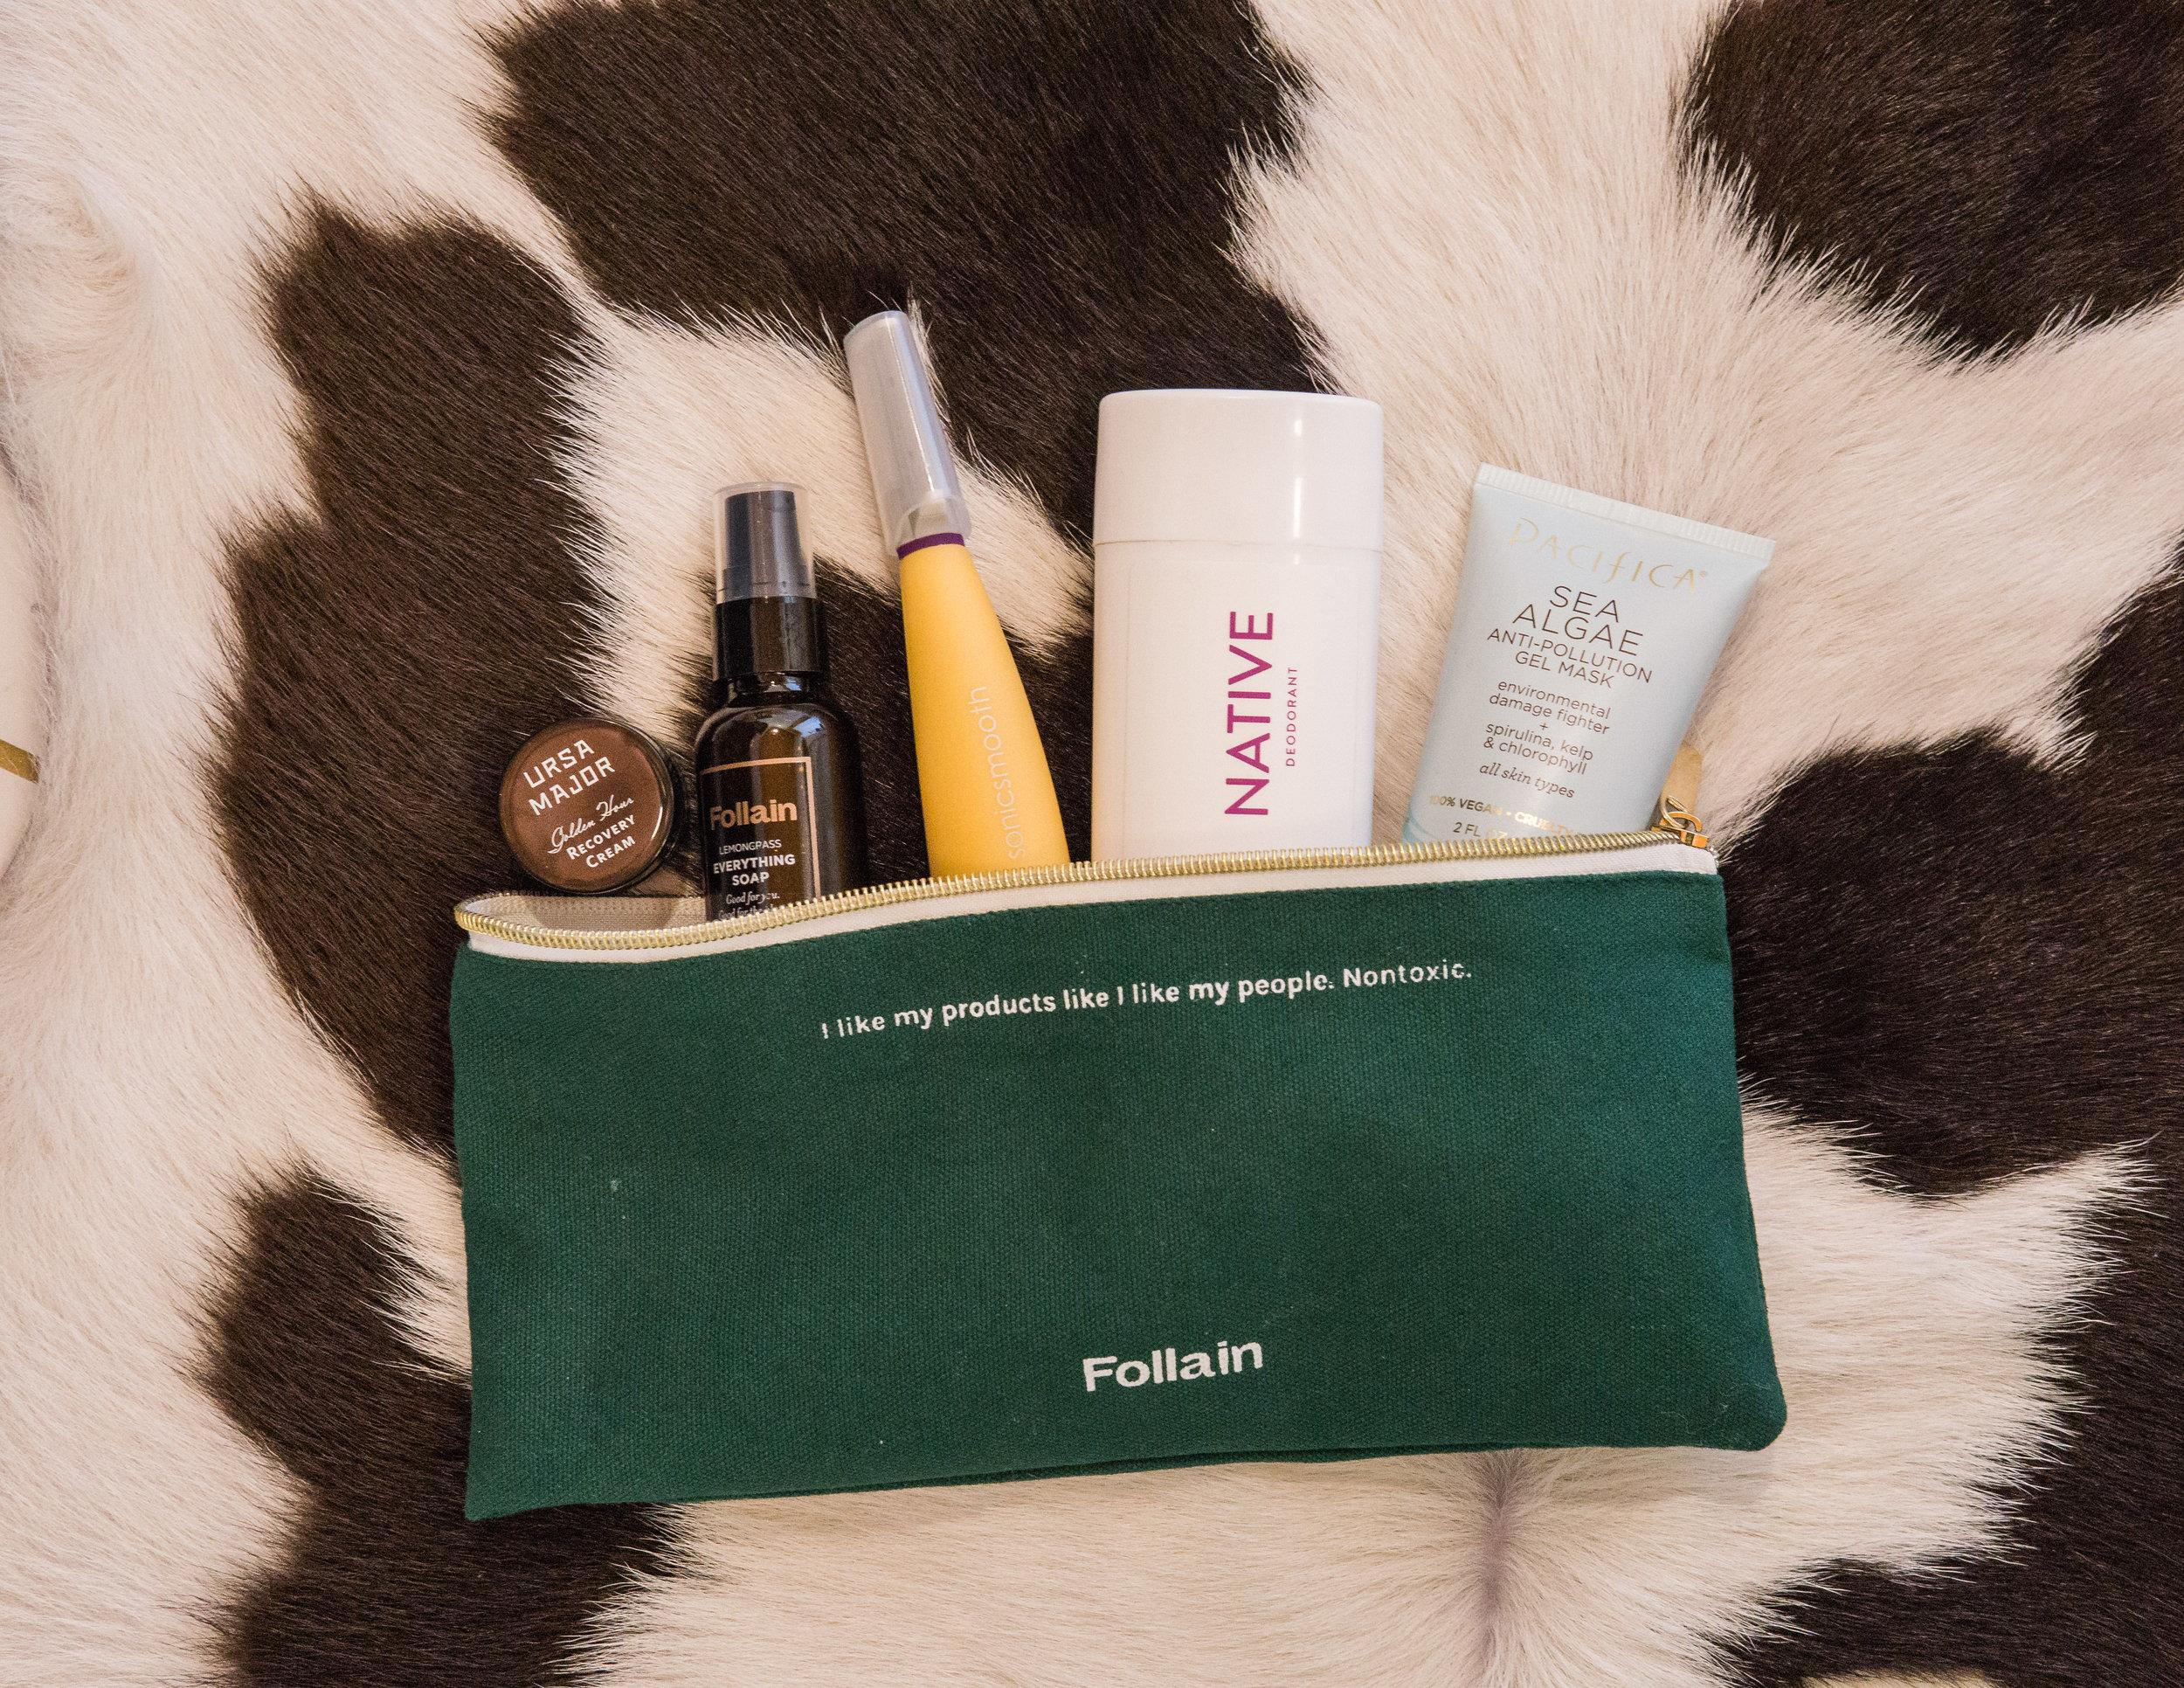 Follain Clean Beauty Guide